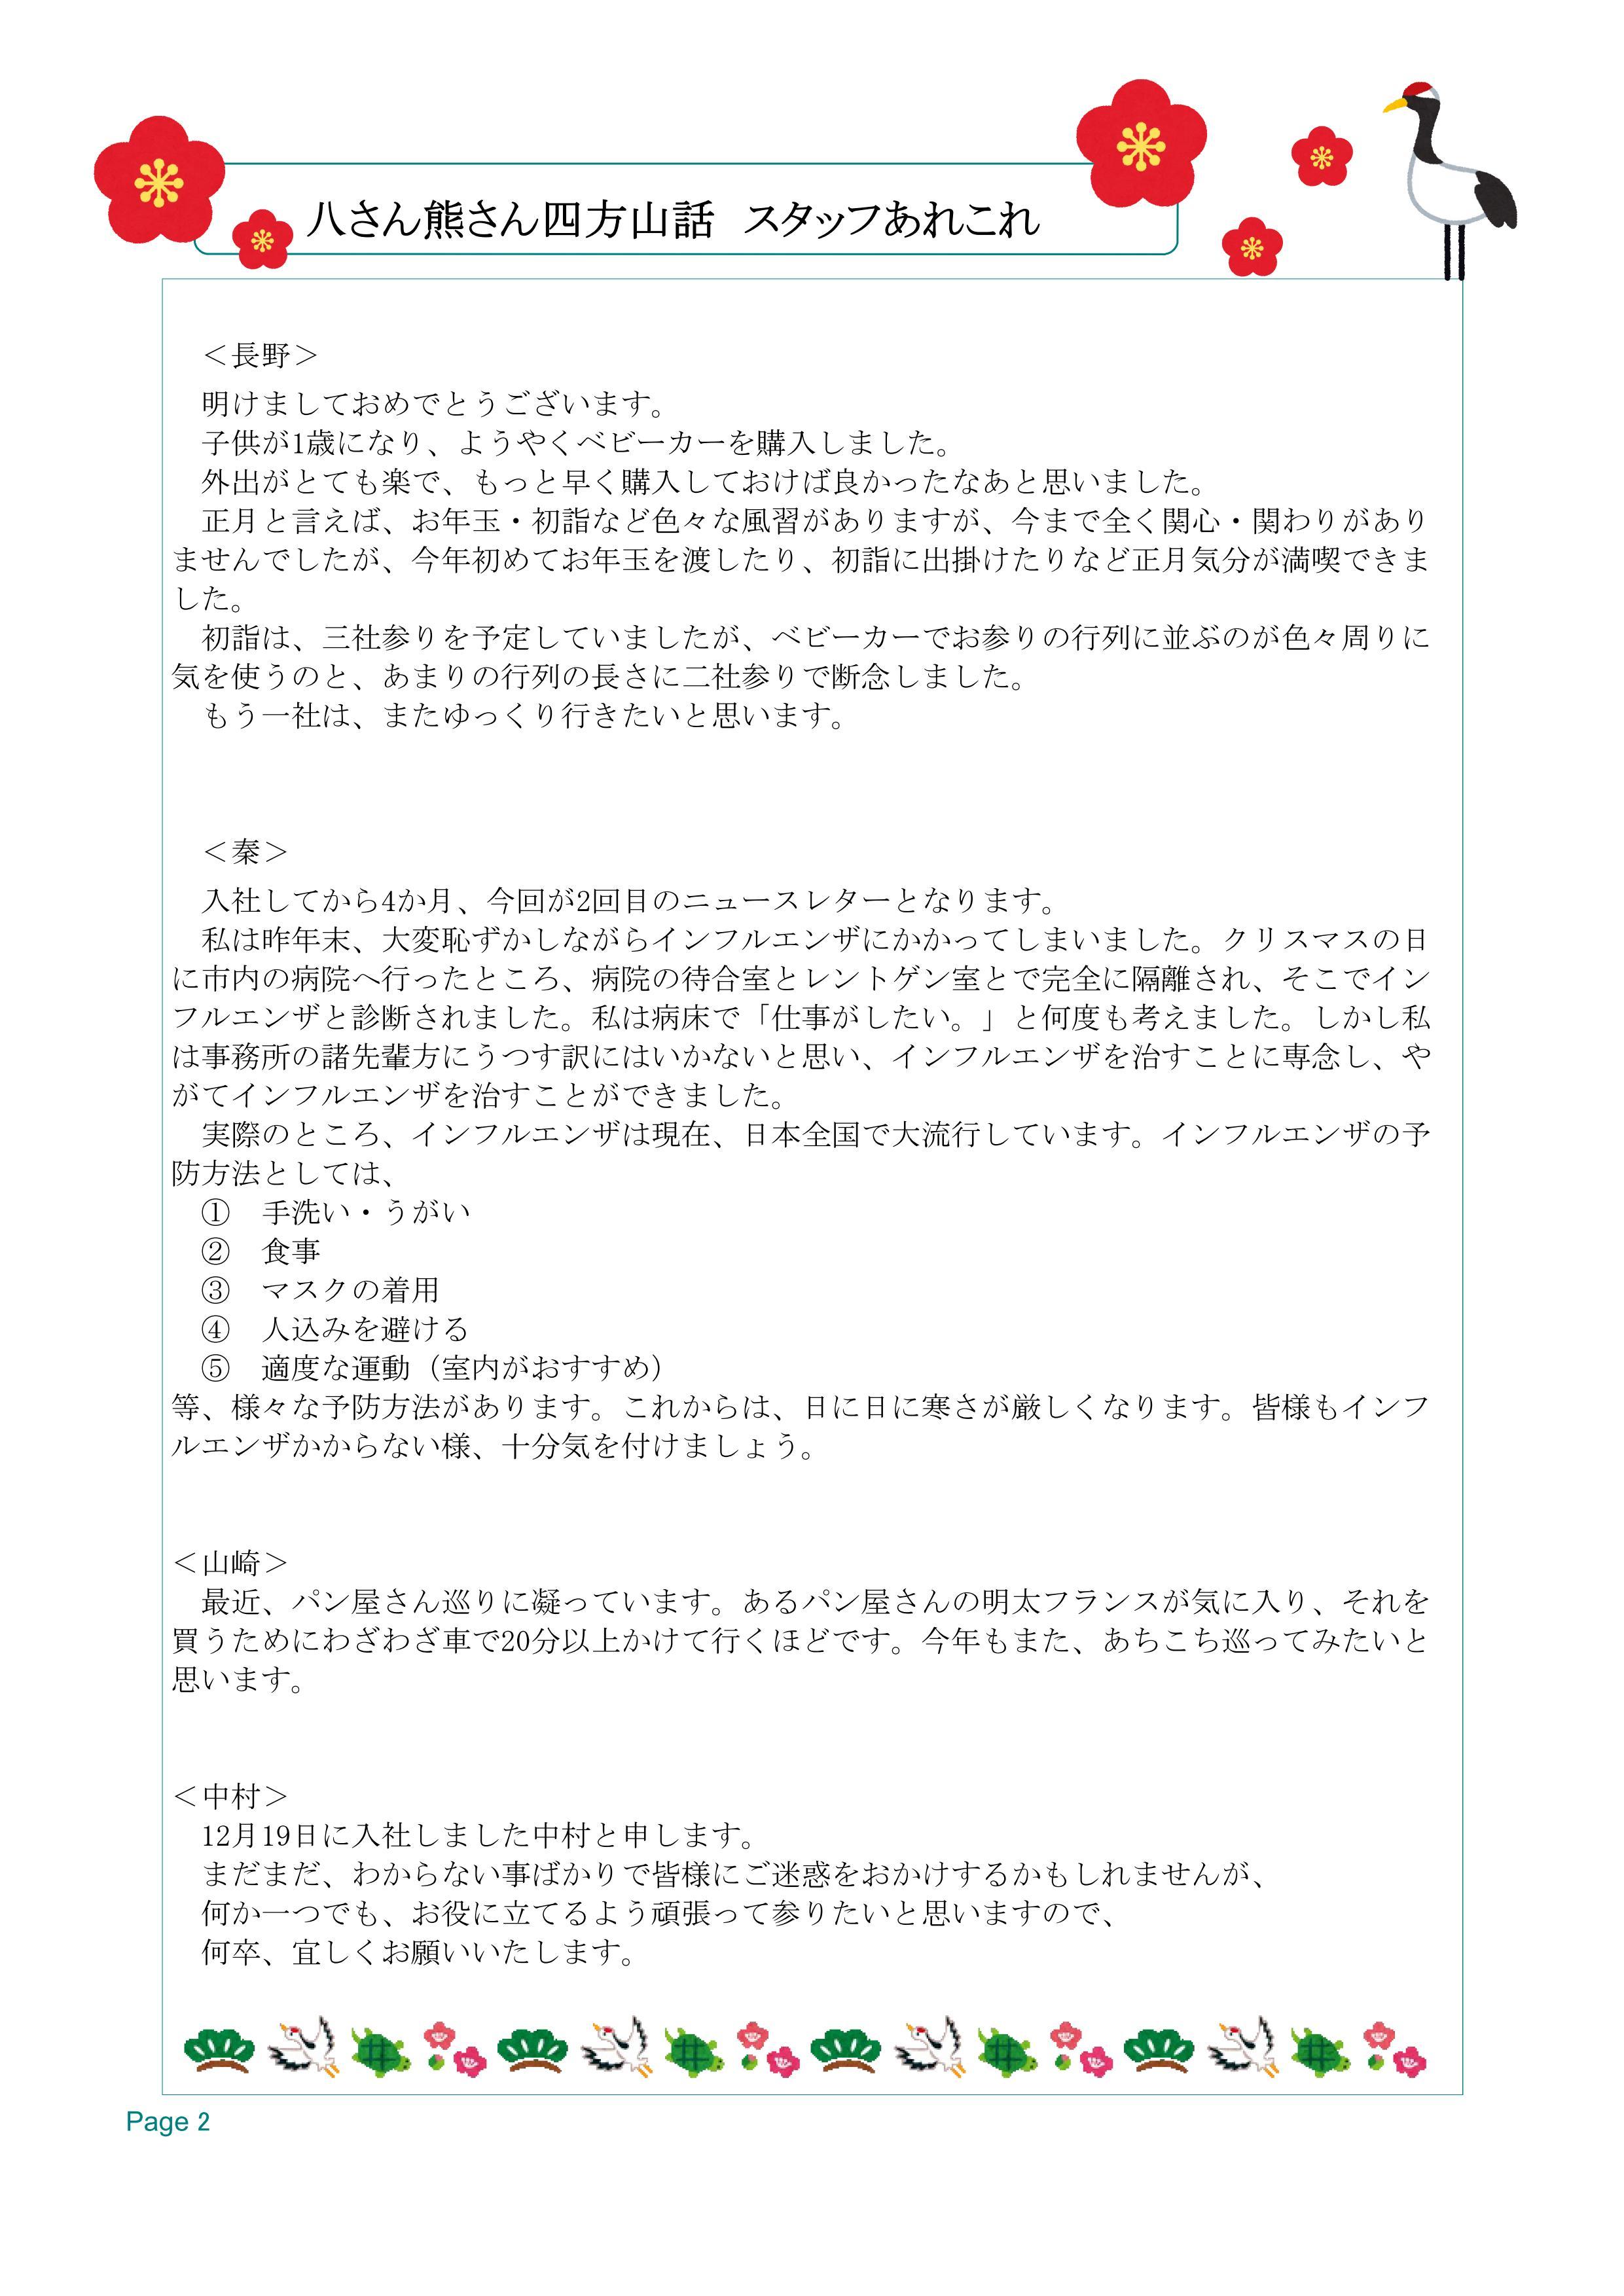 NLH29_02.jpg